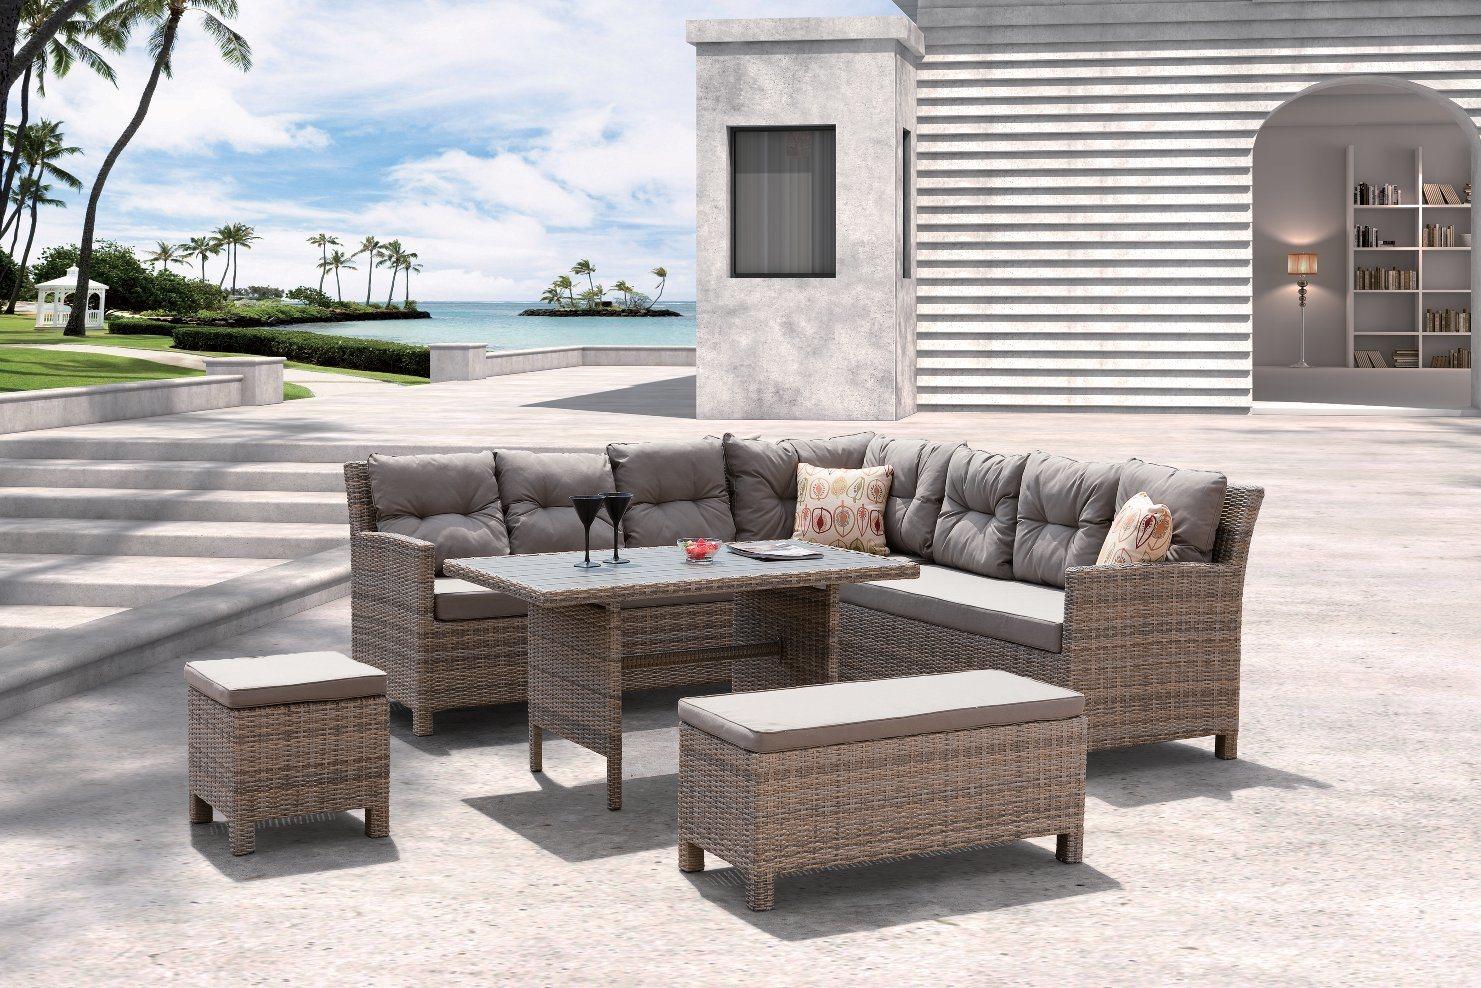 Rattan Garden Patio Barbados Lounge Set Outdoor Furniture (J620)